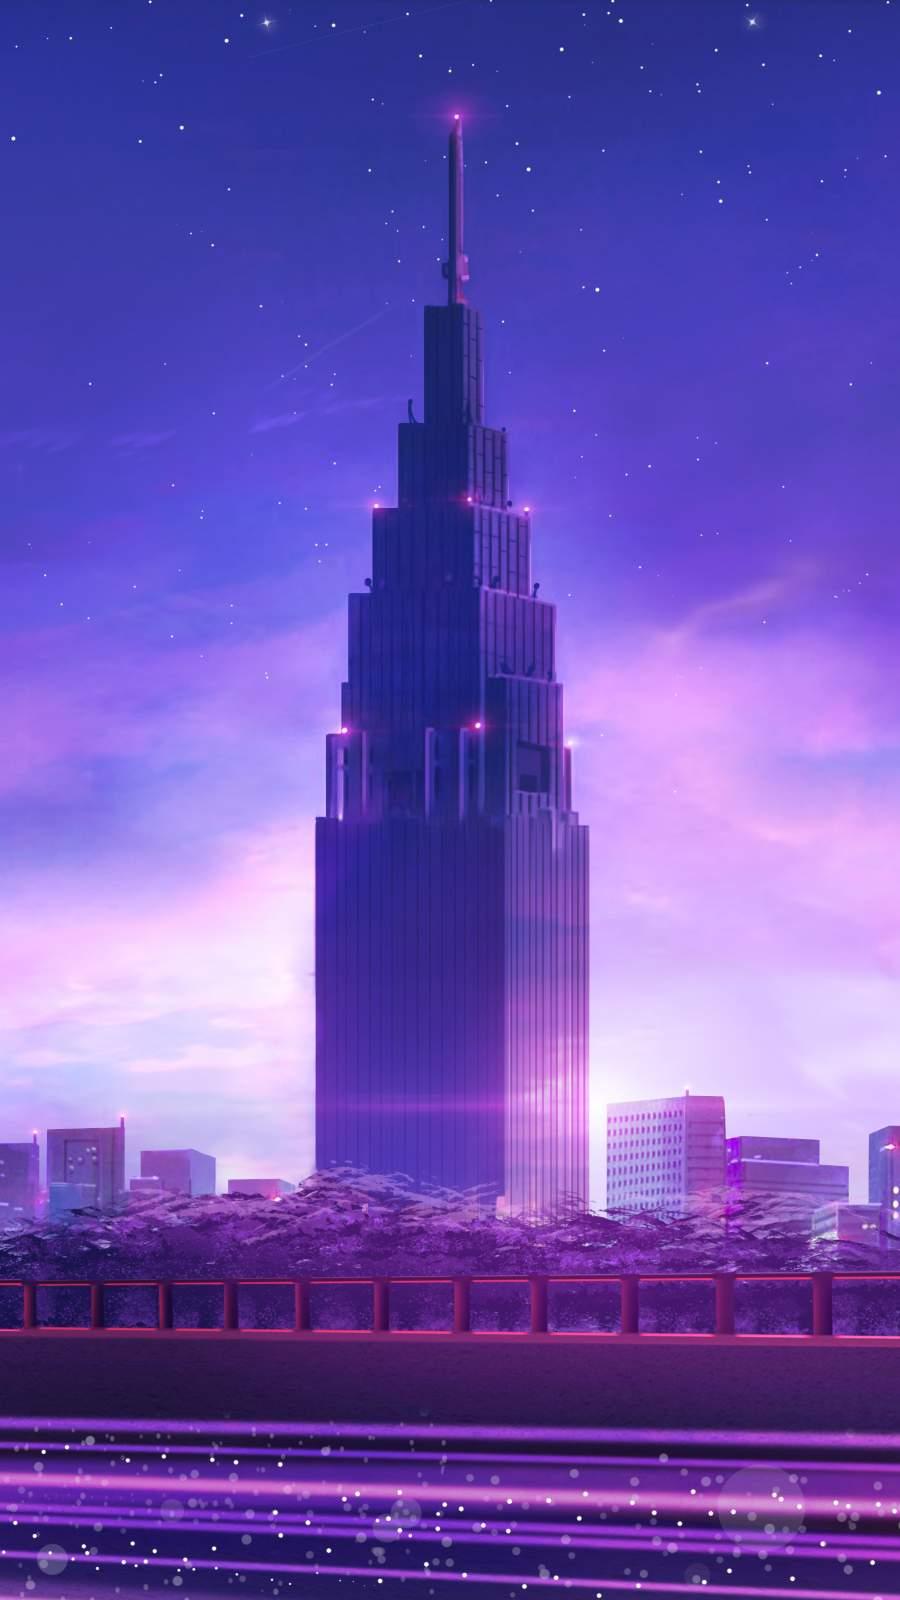 Anime World Skyscraper iPhone Wallpaper